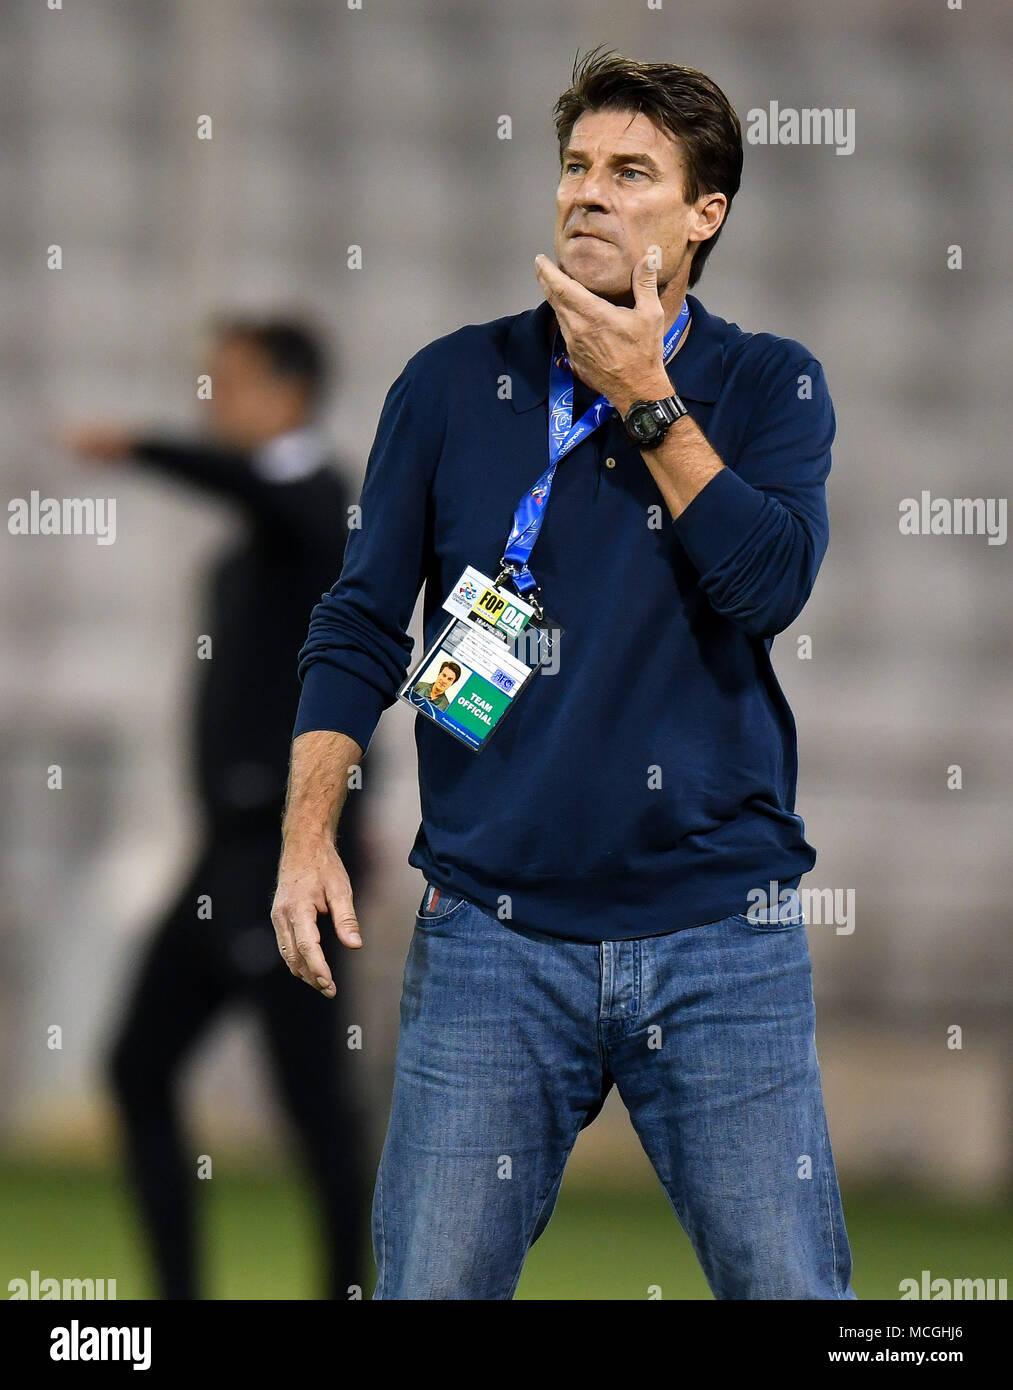 Doha, Qatar. 16th Apr, 2018. Al Rayyan head coach Michael Laudrup reacts during the AFC Champions League Group D soccer match between Qatar's Al Rayyan SC and UAE's Al Ain FC at Jassim Bin Hamad Stadium in Doha, Qatar, April 16, 2018. Al Ain FC won 4-1. Credit: Nikku/Xinhua/Alamy Live News Stock Photo